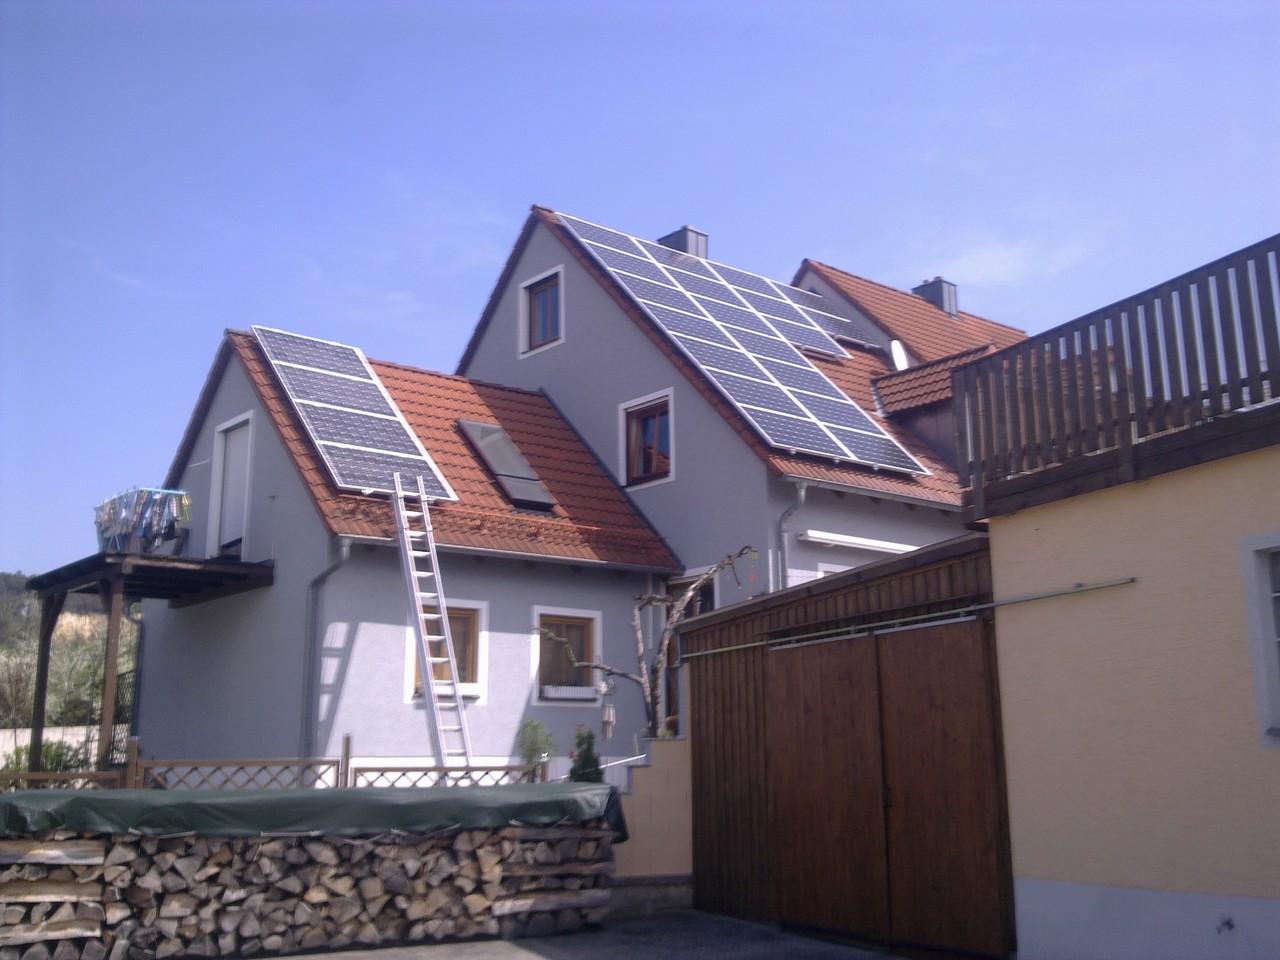 5,5 kWp Photovoltaikanlage in 93077 Bad Abbach